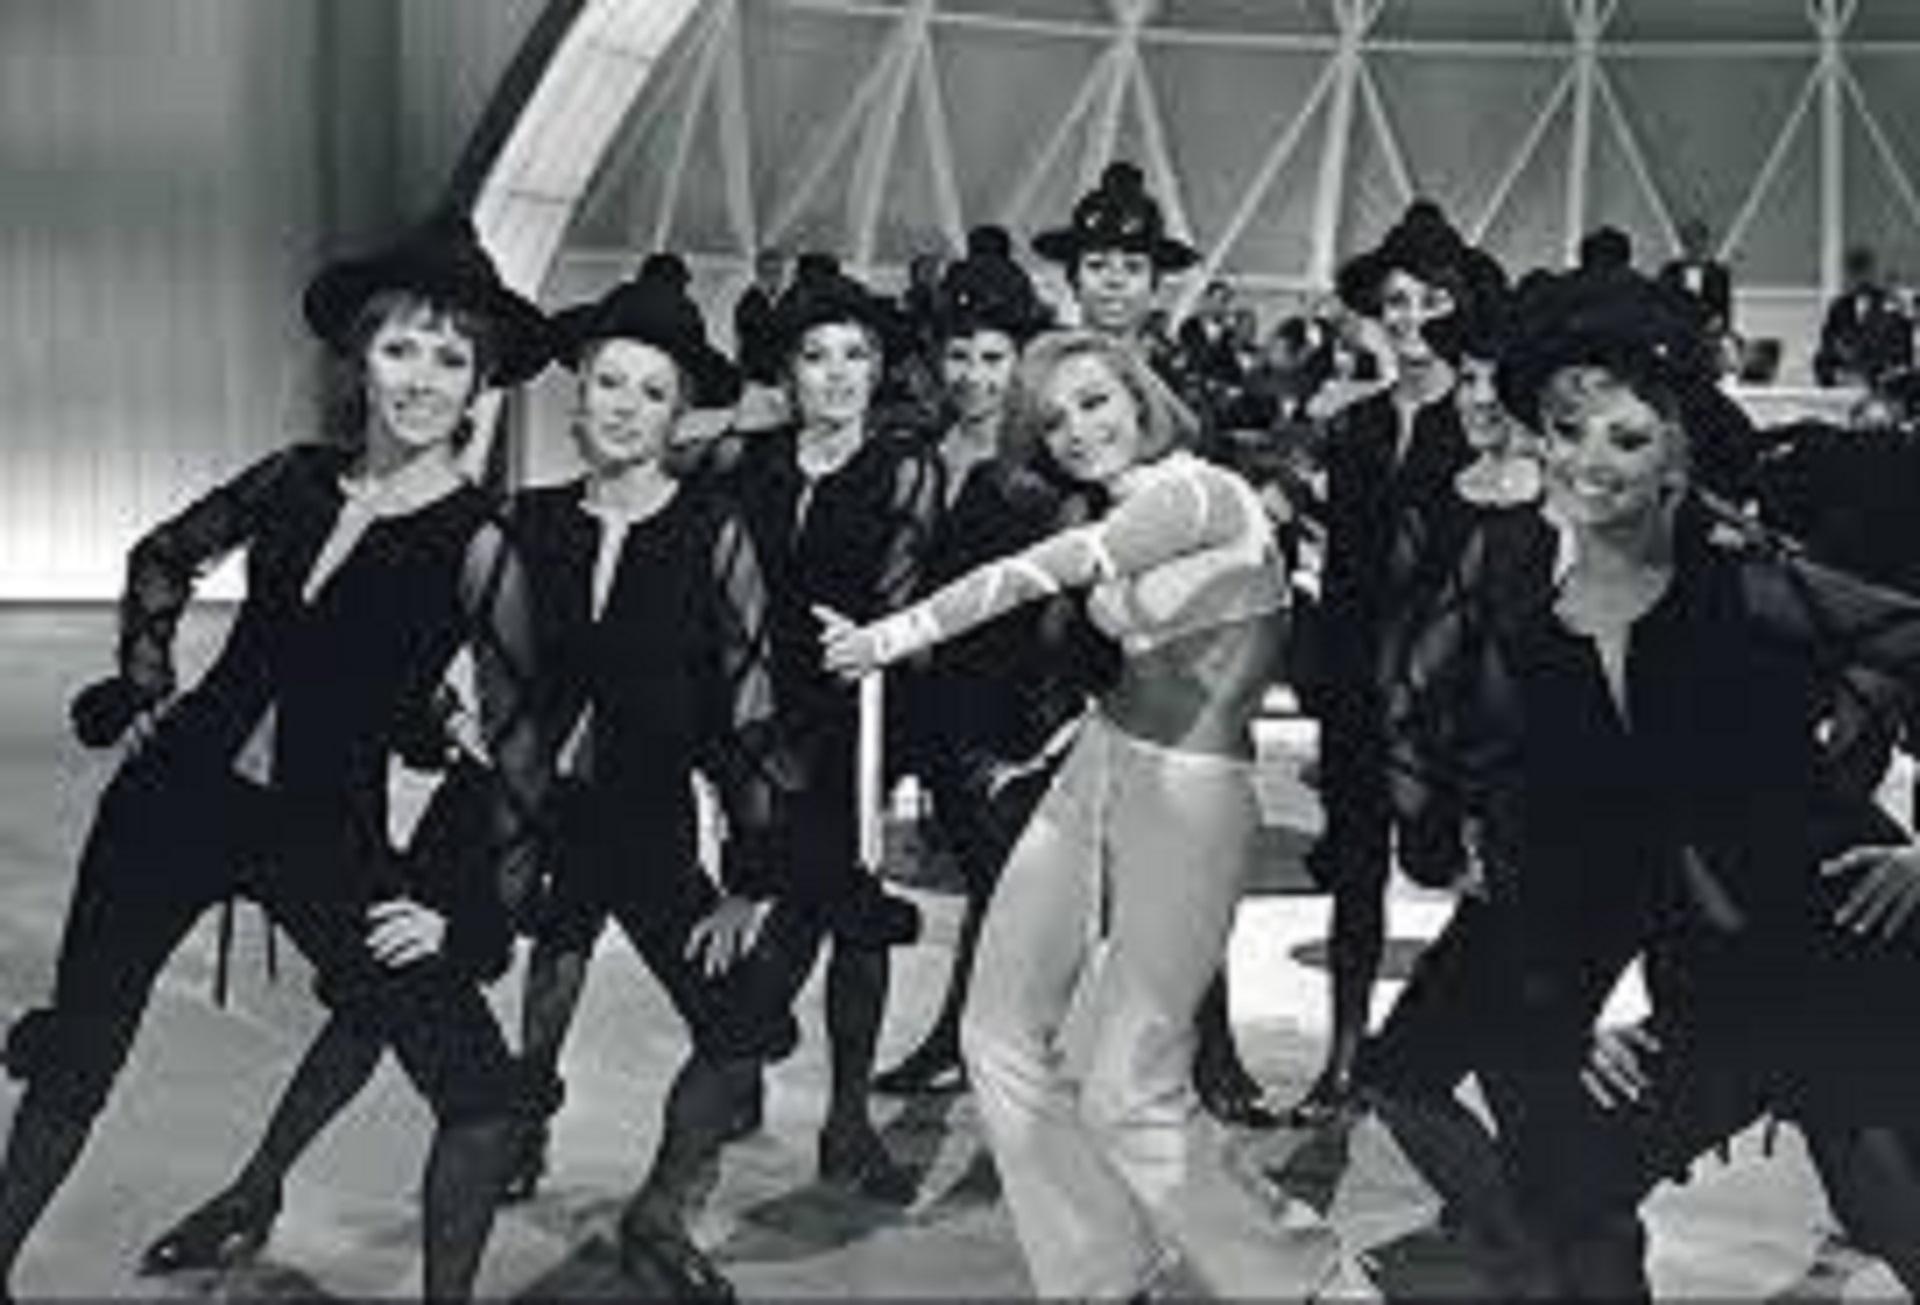 Raffaella Carrá: la diva italiana que rechazó a Sinatra, sedujo a Maradona  e hizo bailar a millones cumple 76 años - Infobae